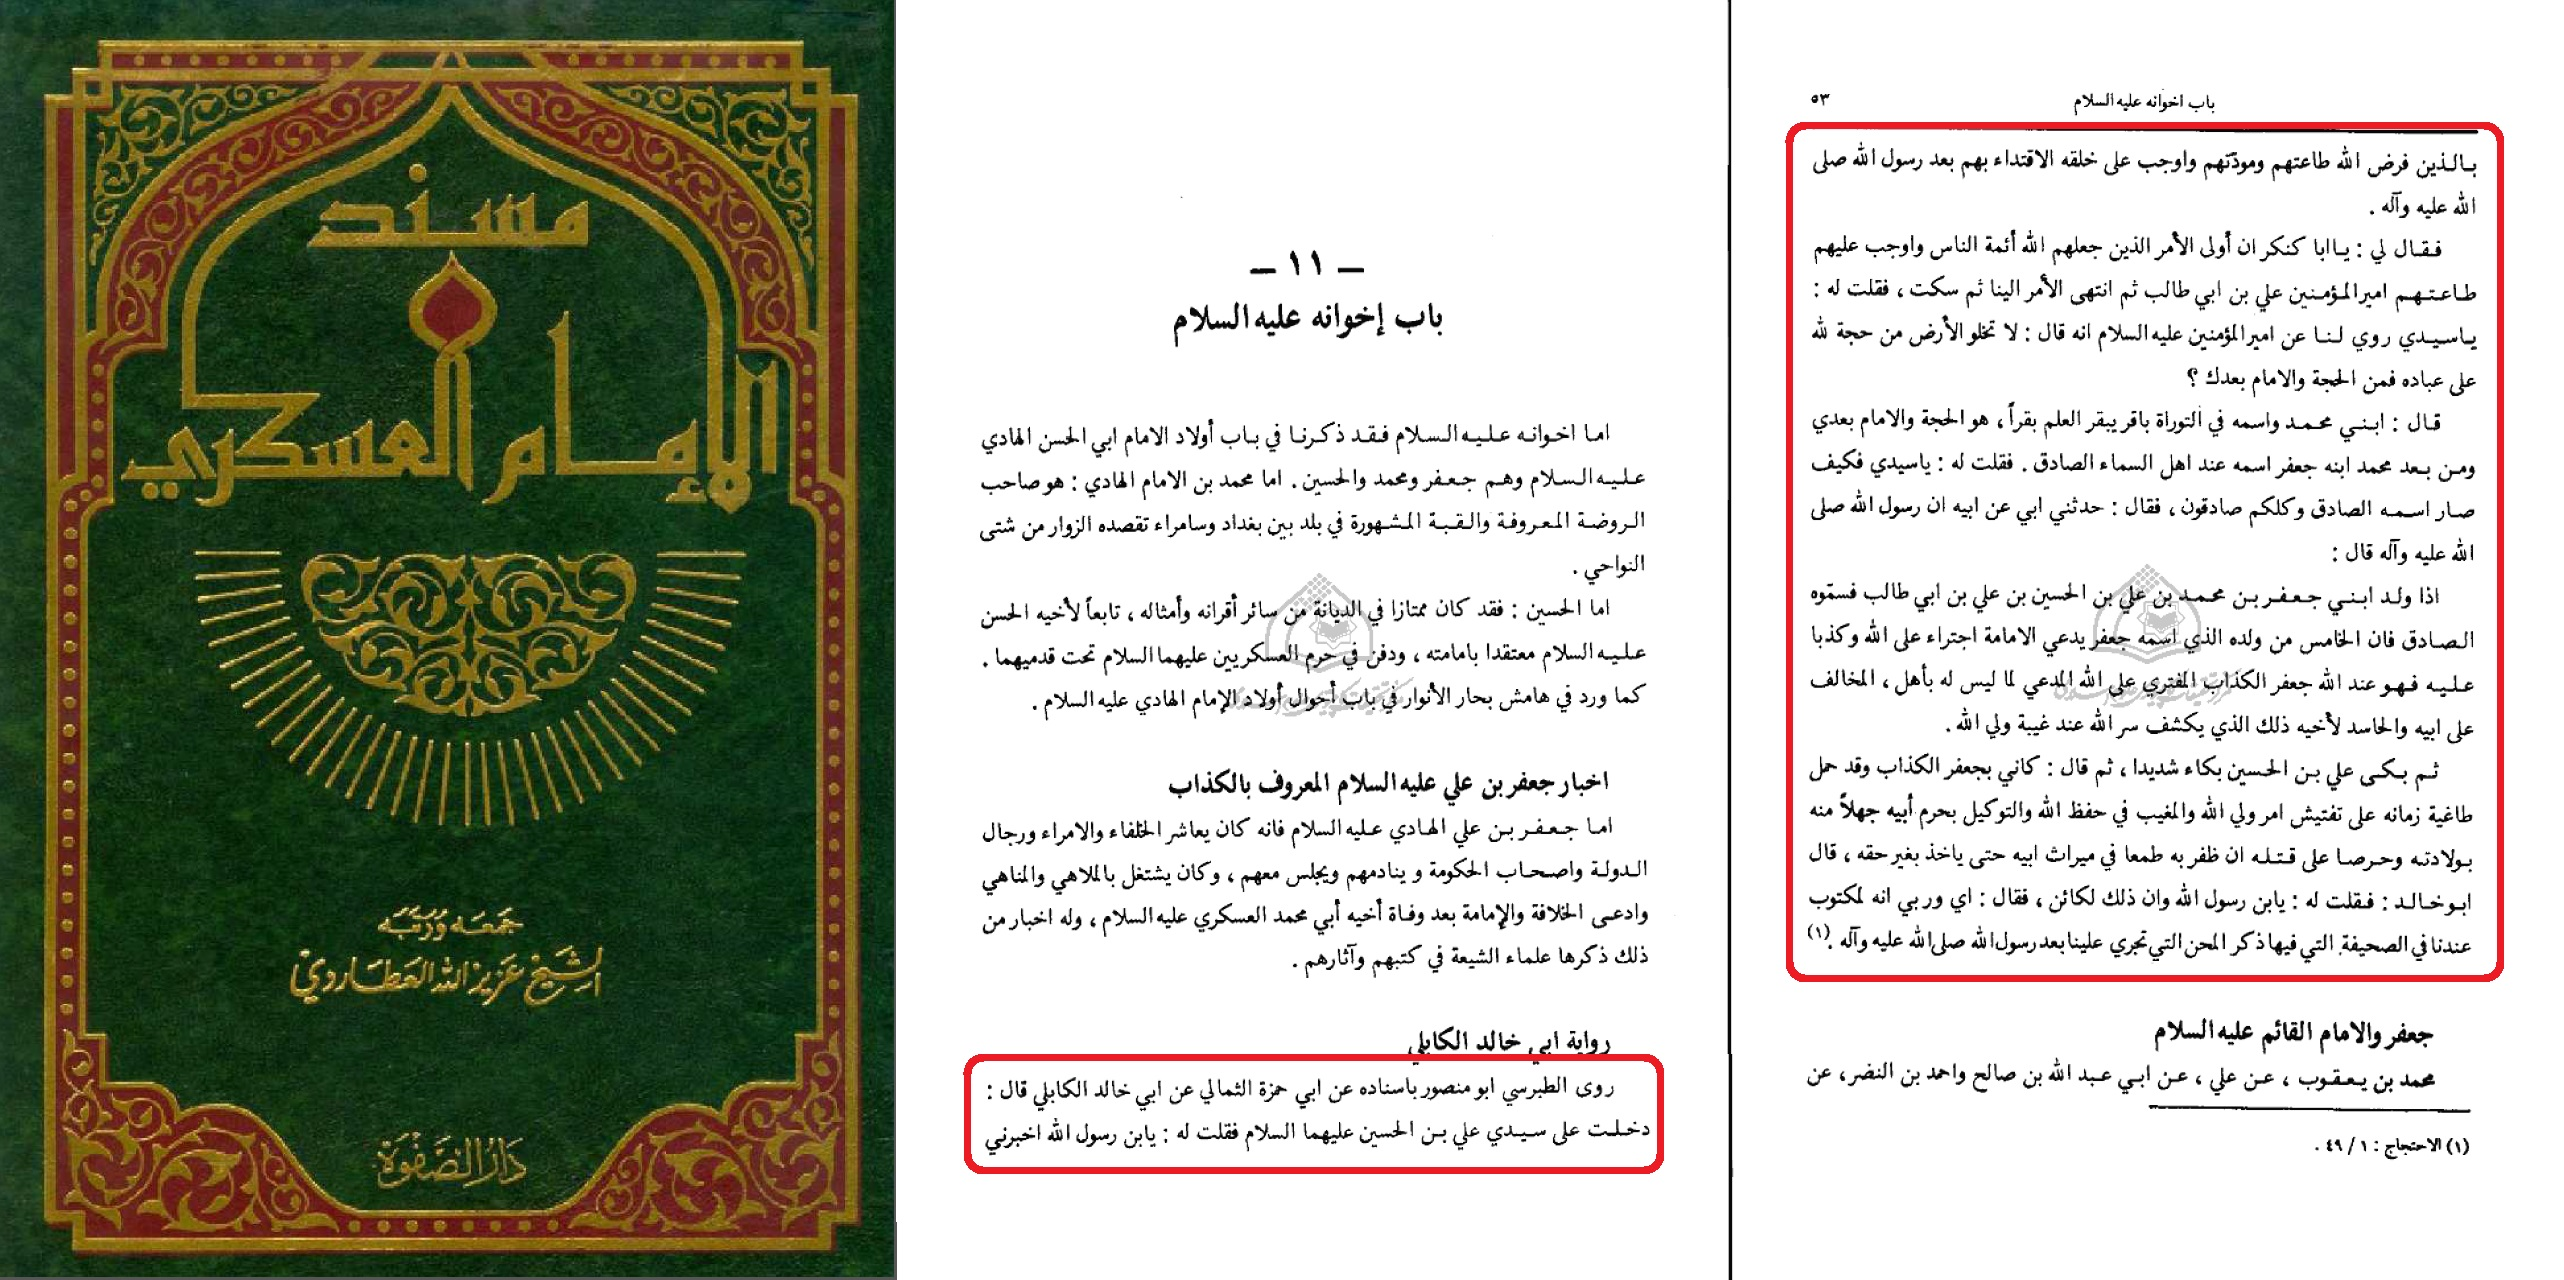 mosnad-e 3askari b 52 - 53